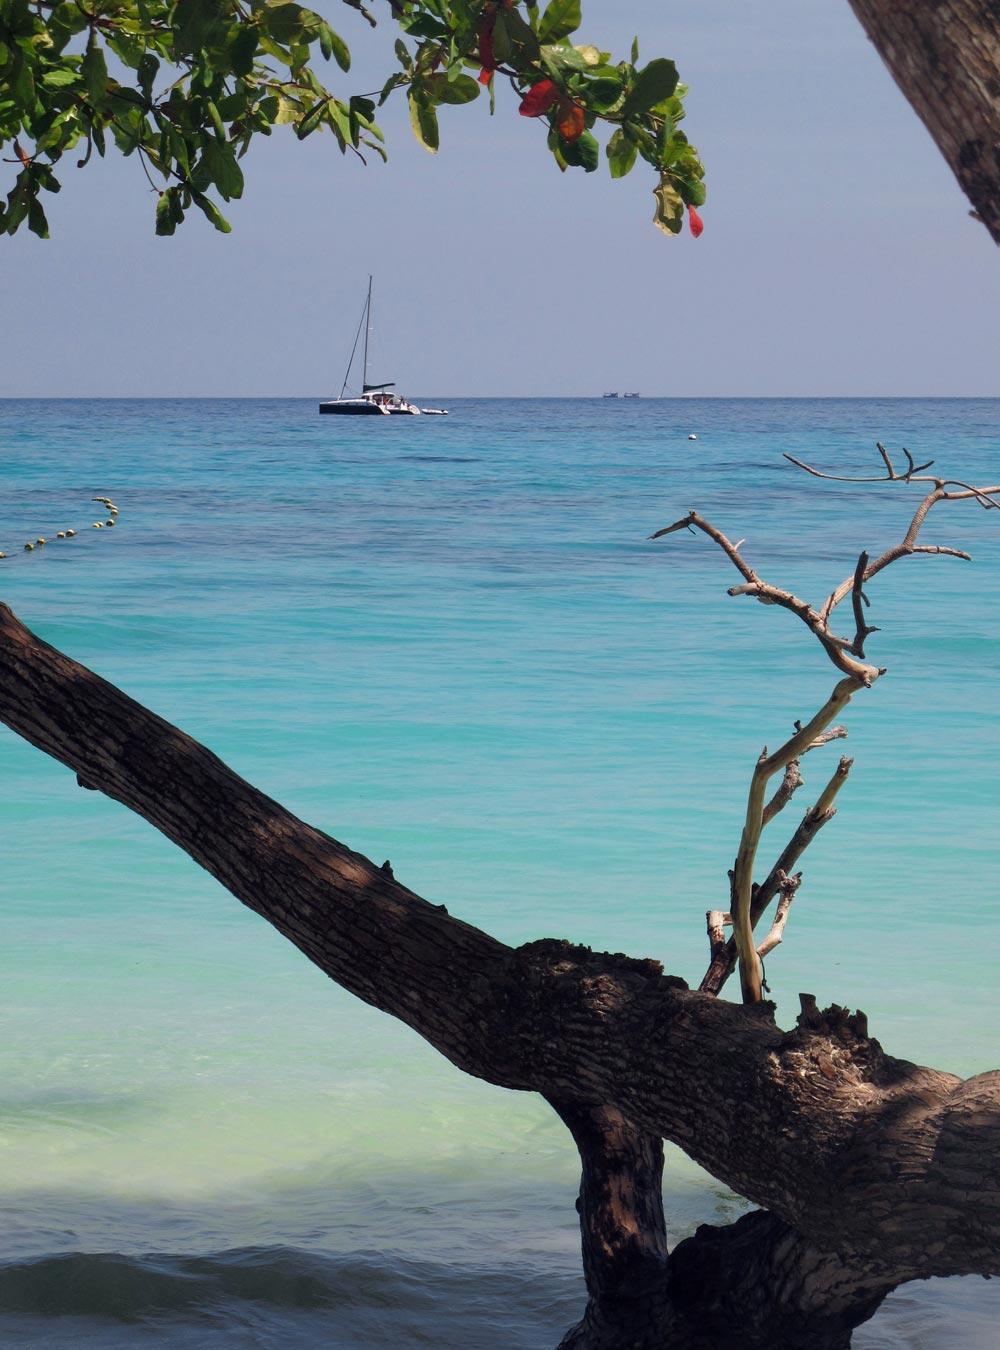 Idyllic island - Koh Rok Nok